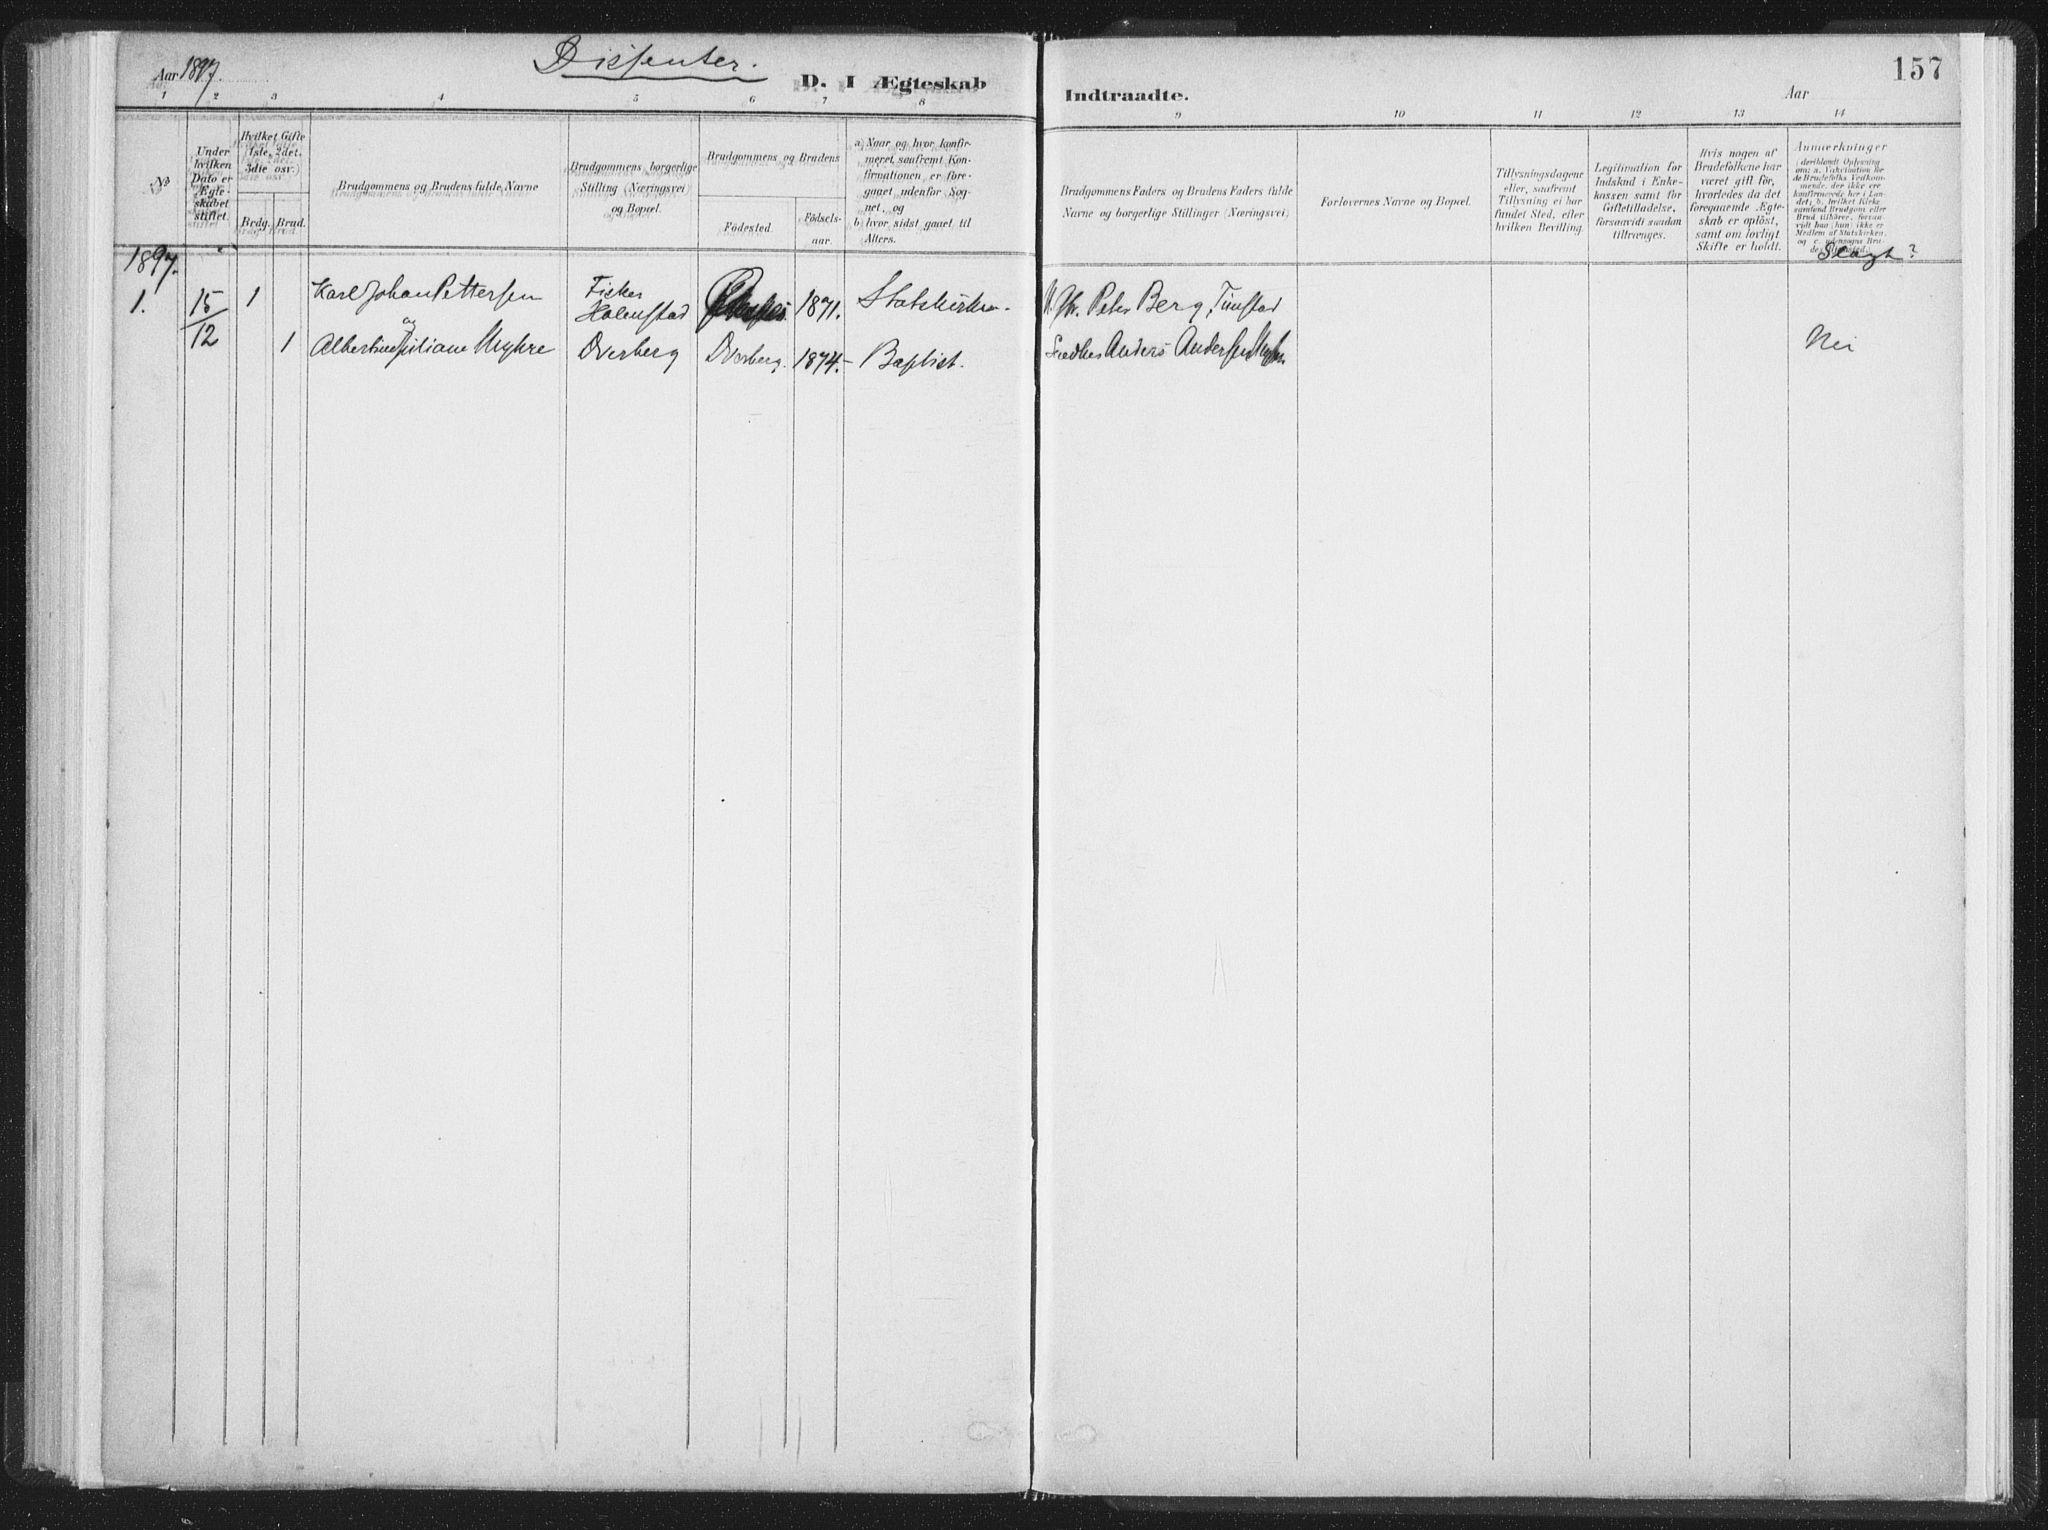 SAT, Ministerialprotokoller, klokkerbøker og fødselsregistre - Nordland, 890/L1286: Ministerialbok nr. 890A01, 1882-1902, s. 157